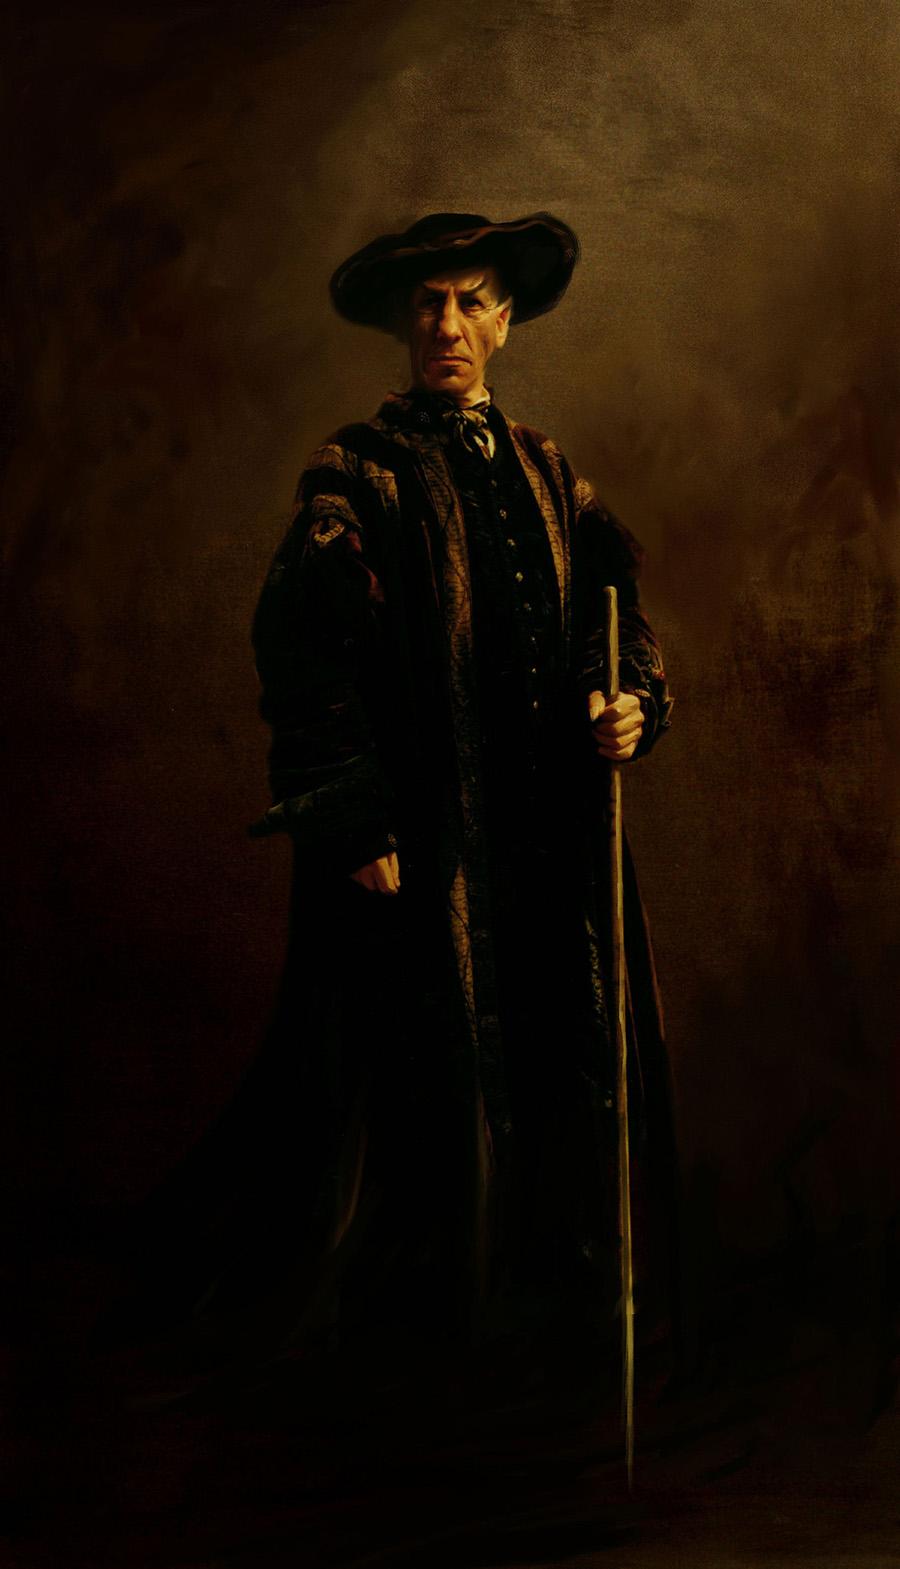 Harry Potter - Hogwarts Wizard Portrait 05.jpg